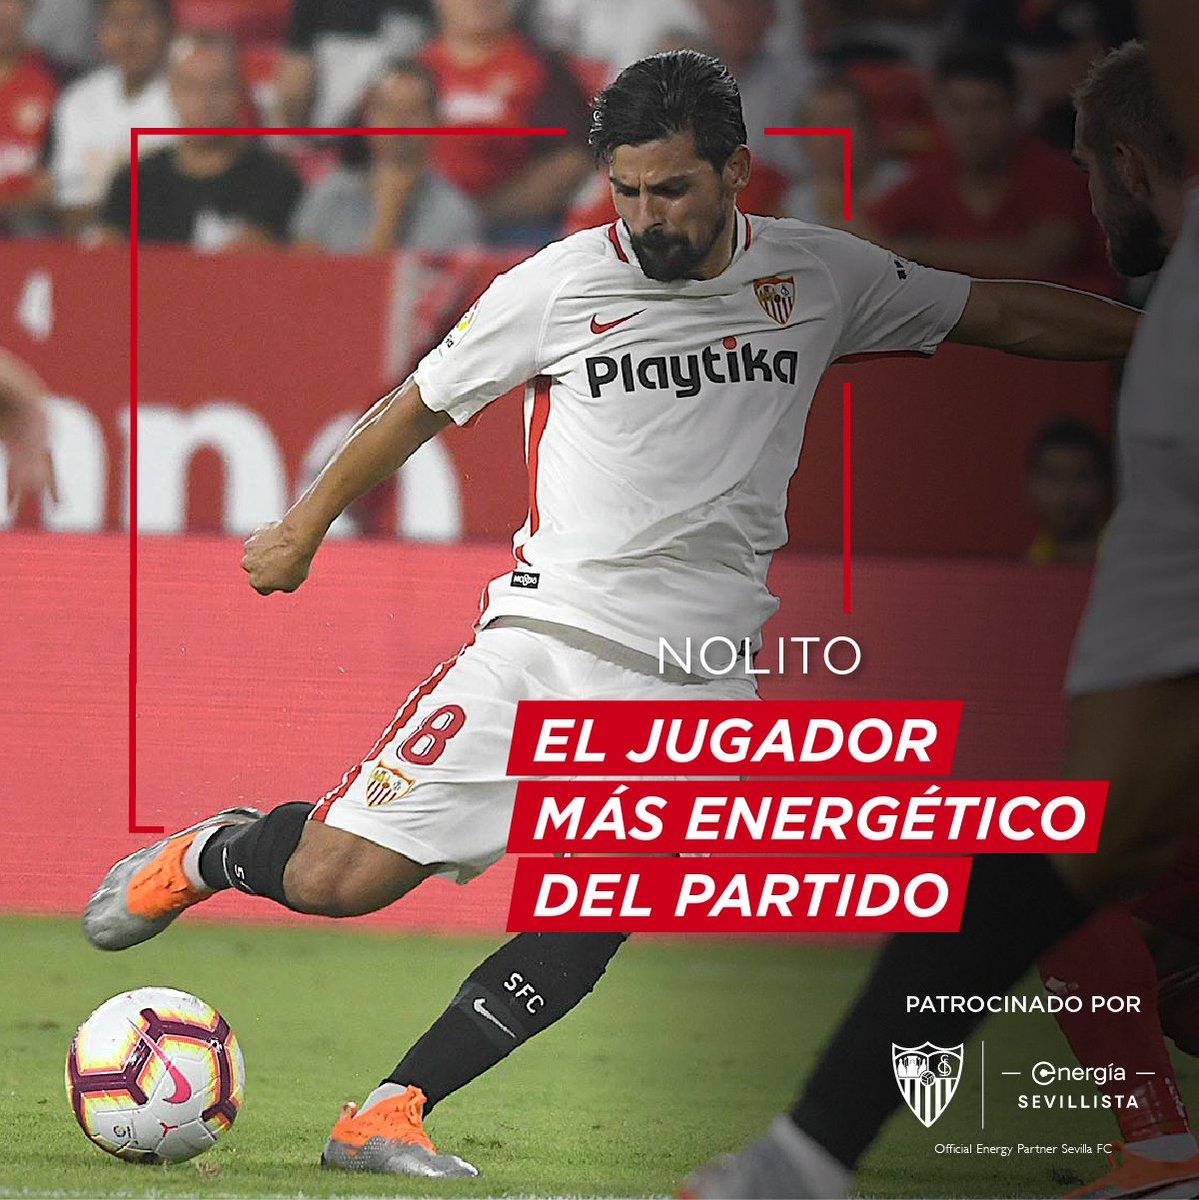 Sevilla Fútbol Club's photo on nolito